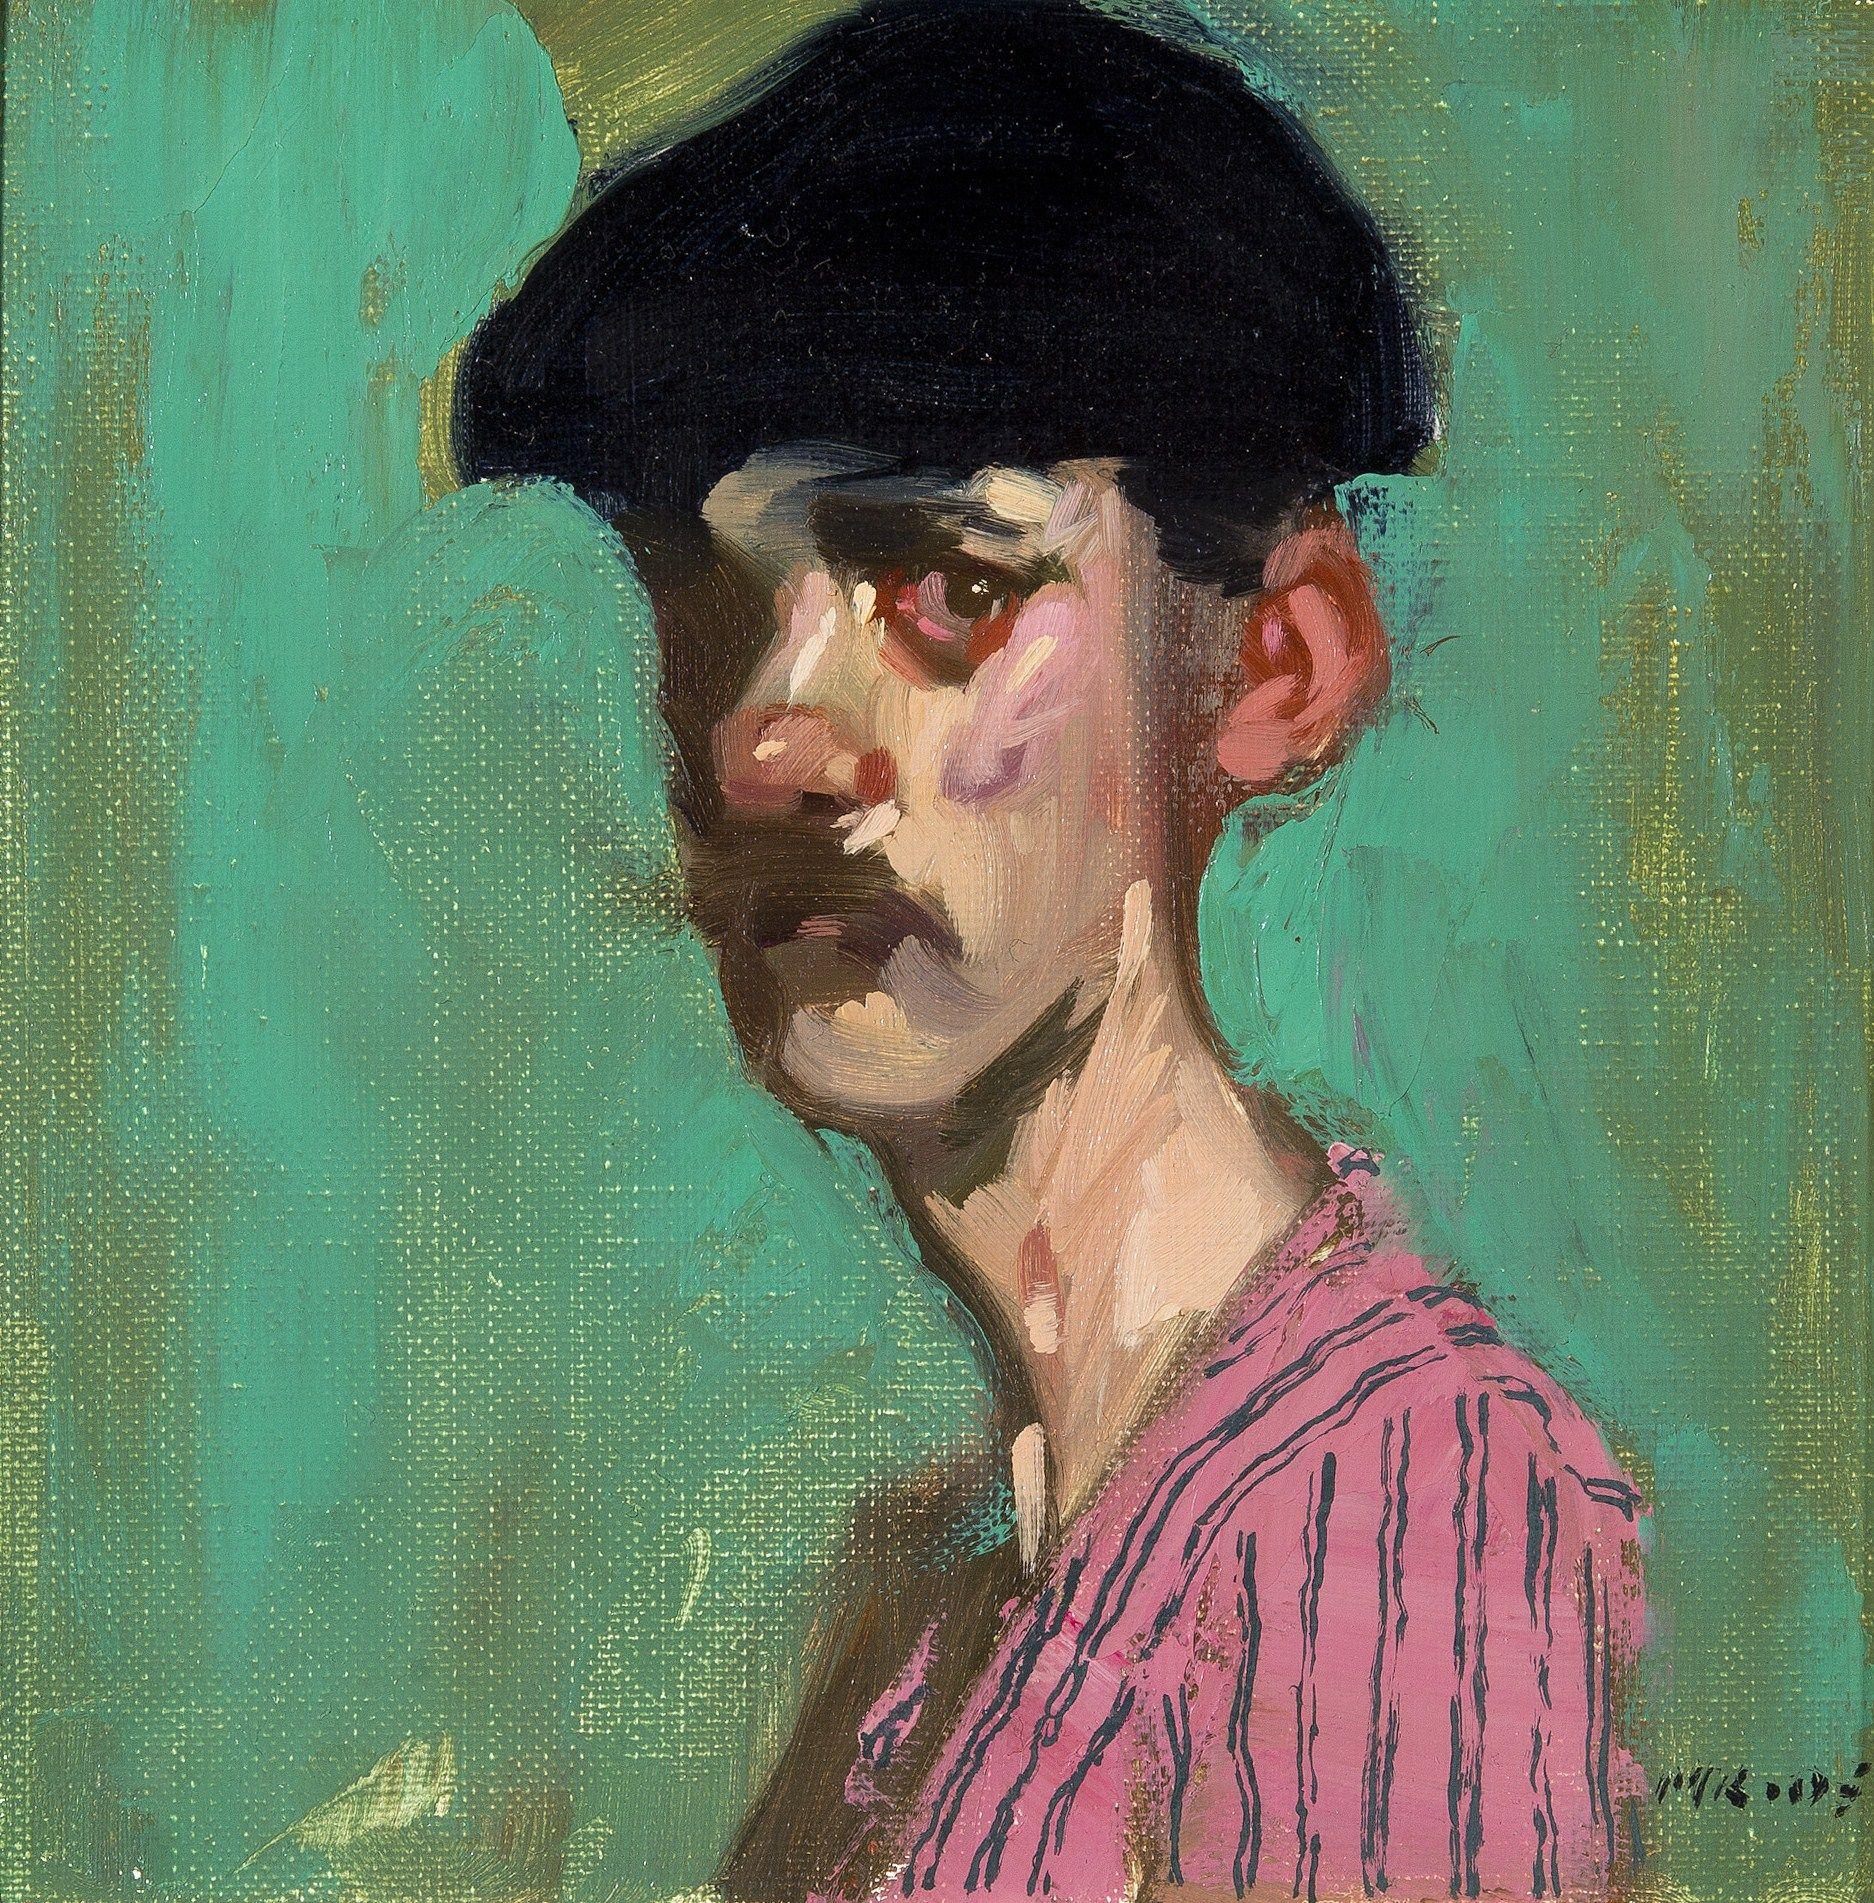 Milt Kobayashi: Coney Island Barker | Oil | 8 x 8